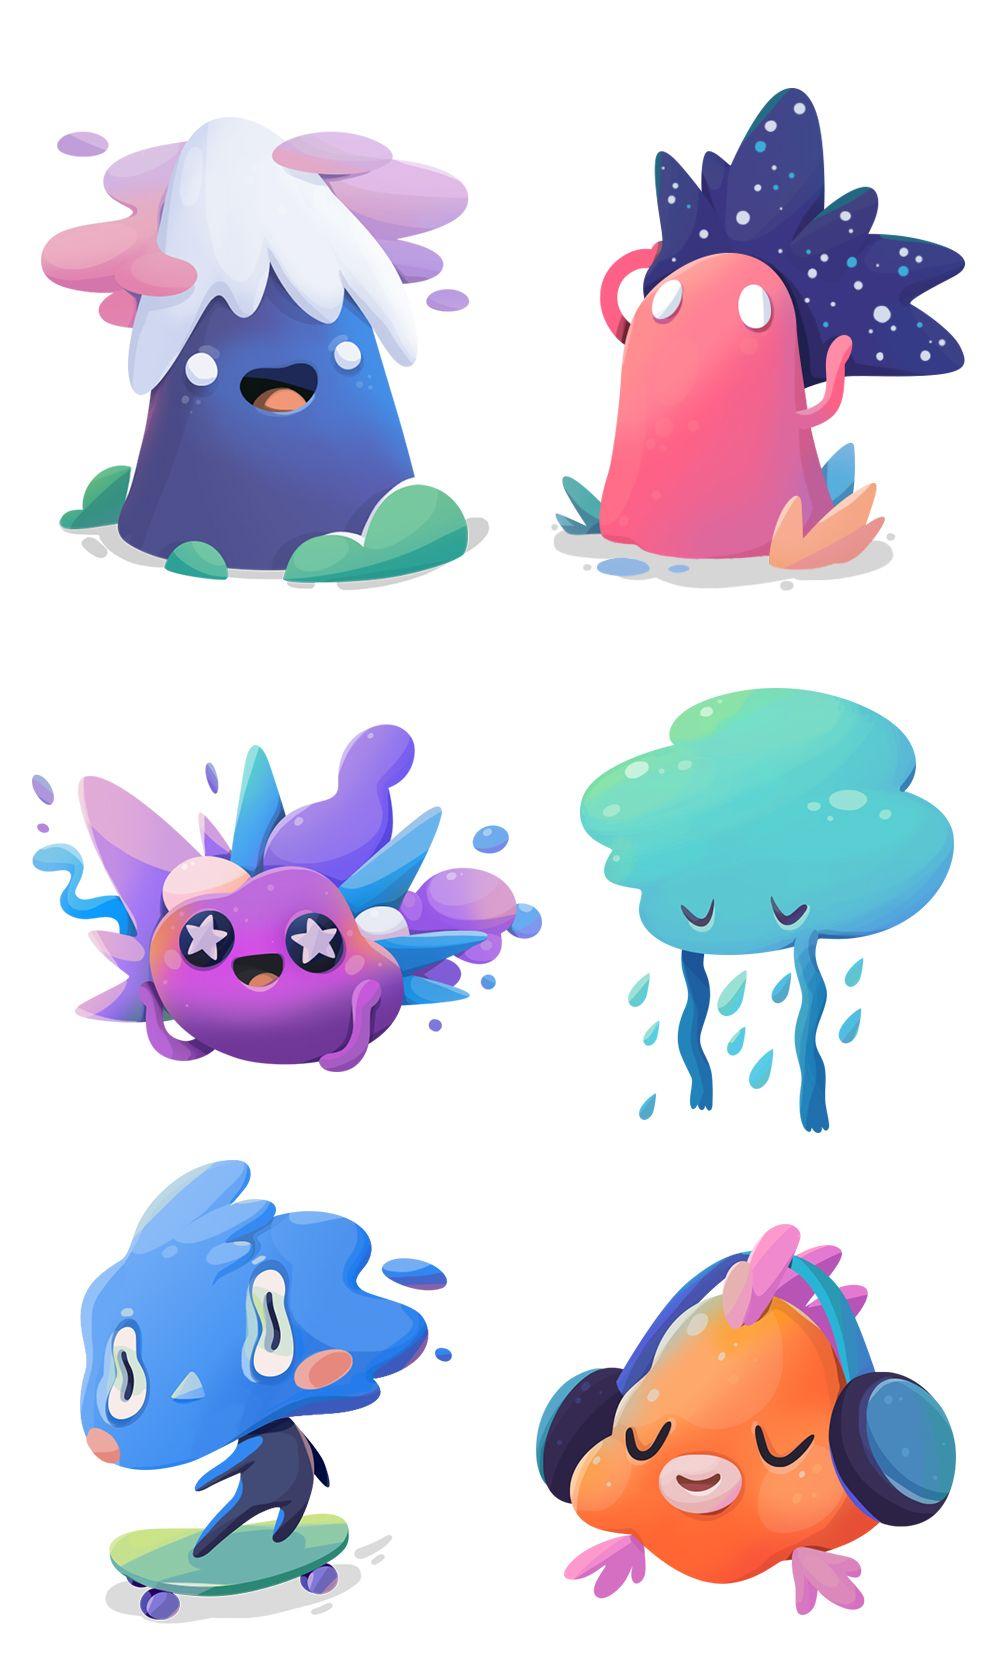 Doodles Lab For Stickerplace On Behance Pinterest Sticker Karakter